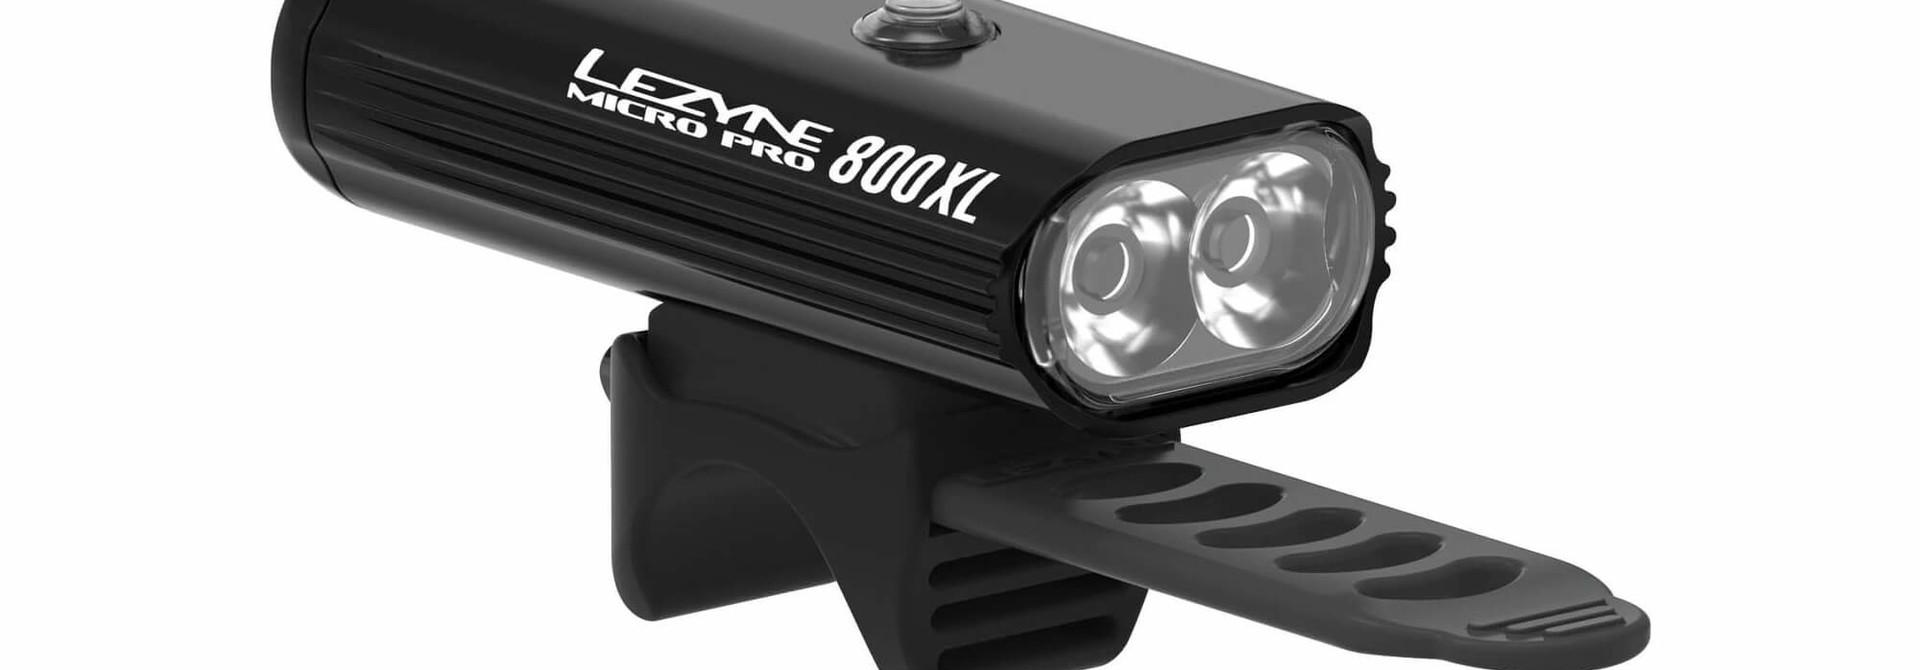 Micro Drive Pro 800XL - Black